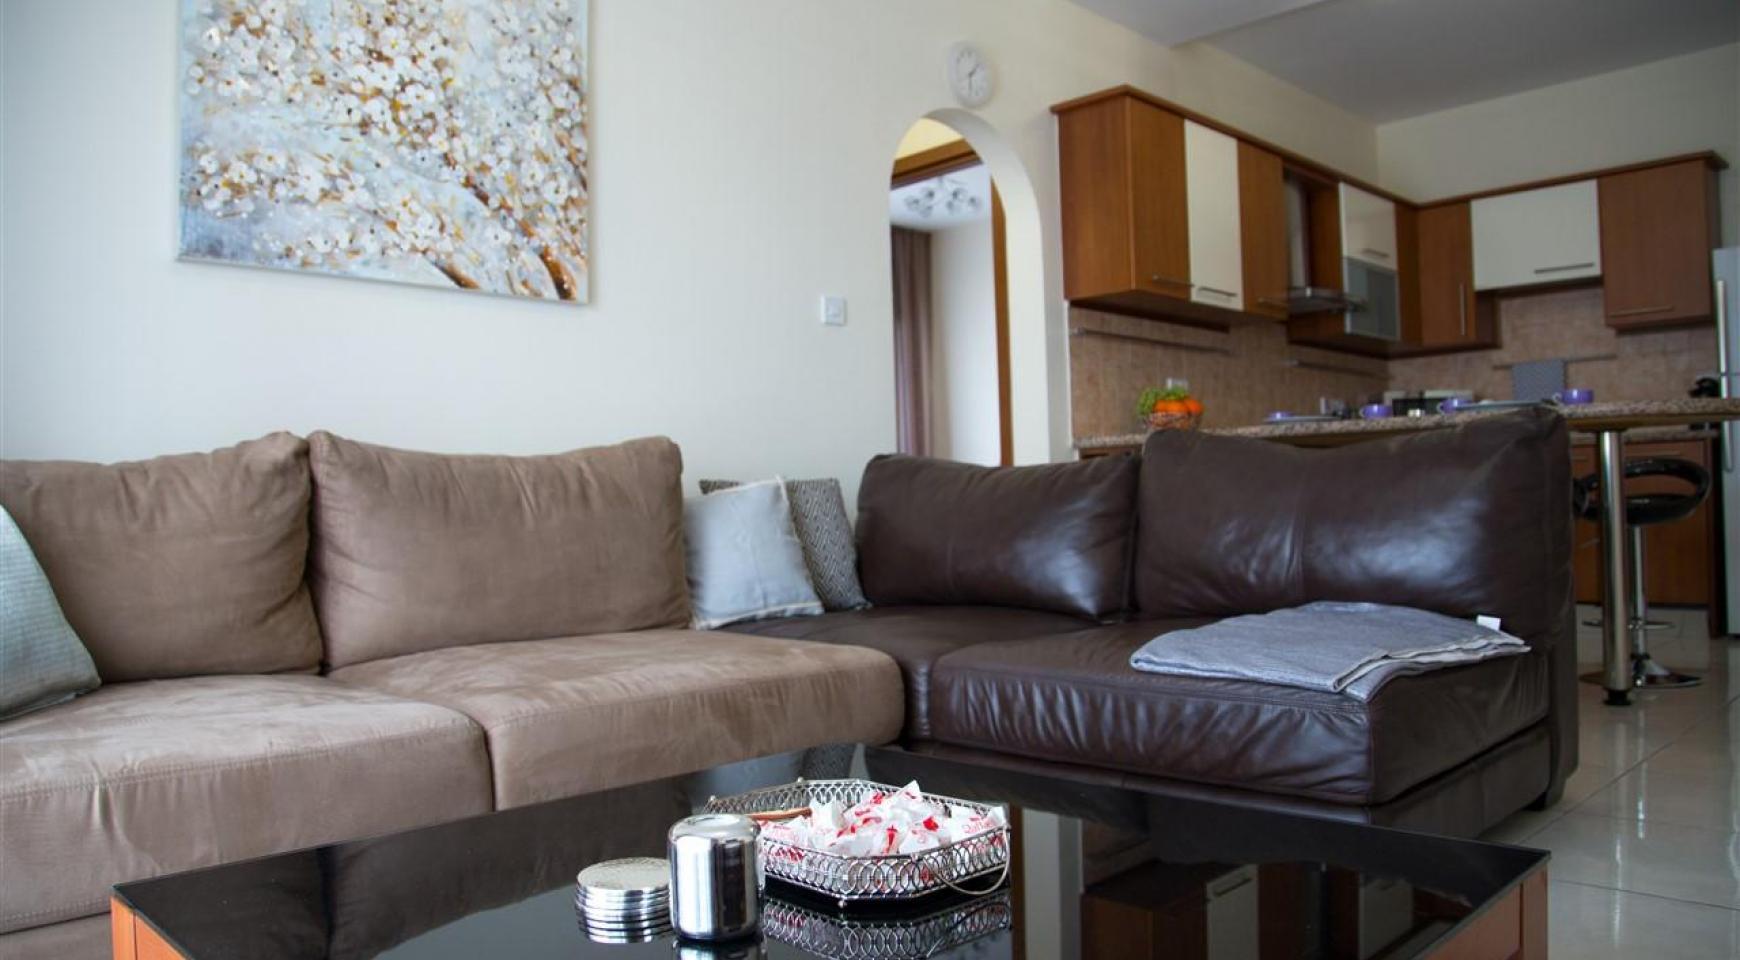 Luxury 2 Bedroom Apartment Mesogios Iris 304 in the Tourist area near the Beach - 5